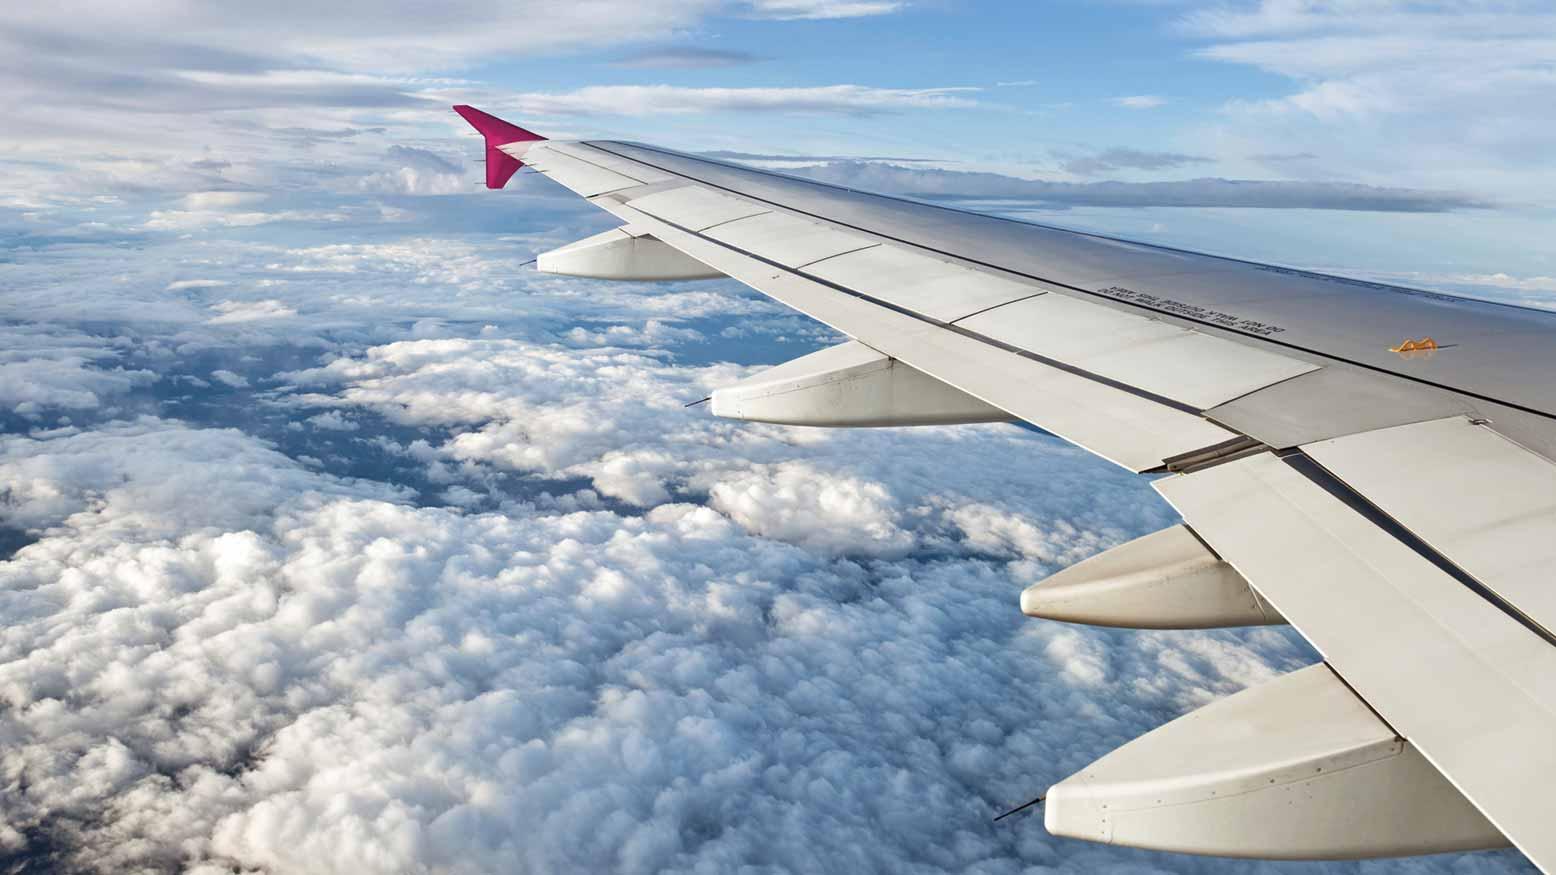 Clouds viewed from a passenger aircraft